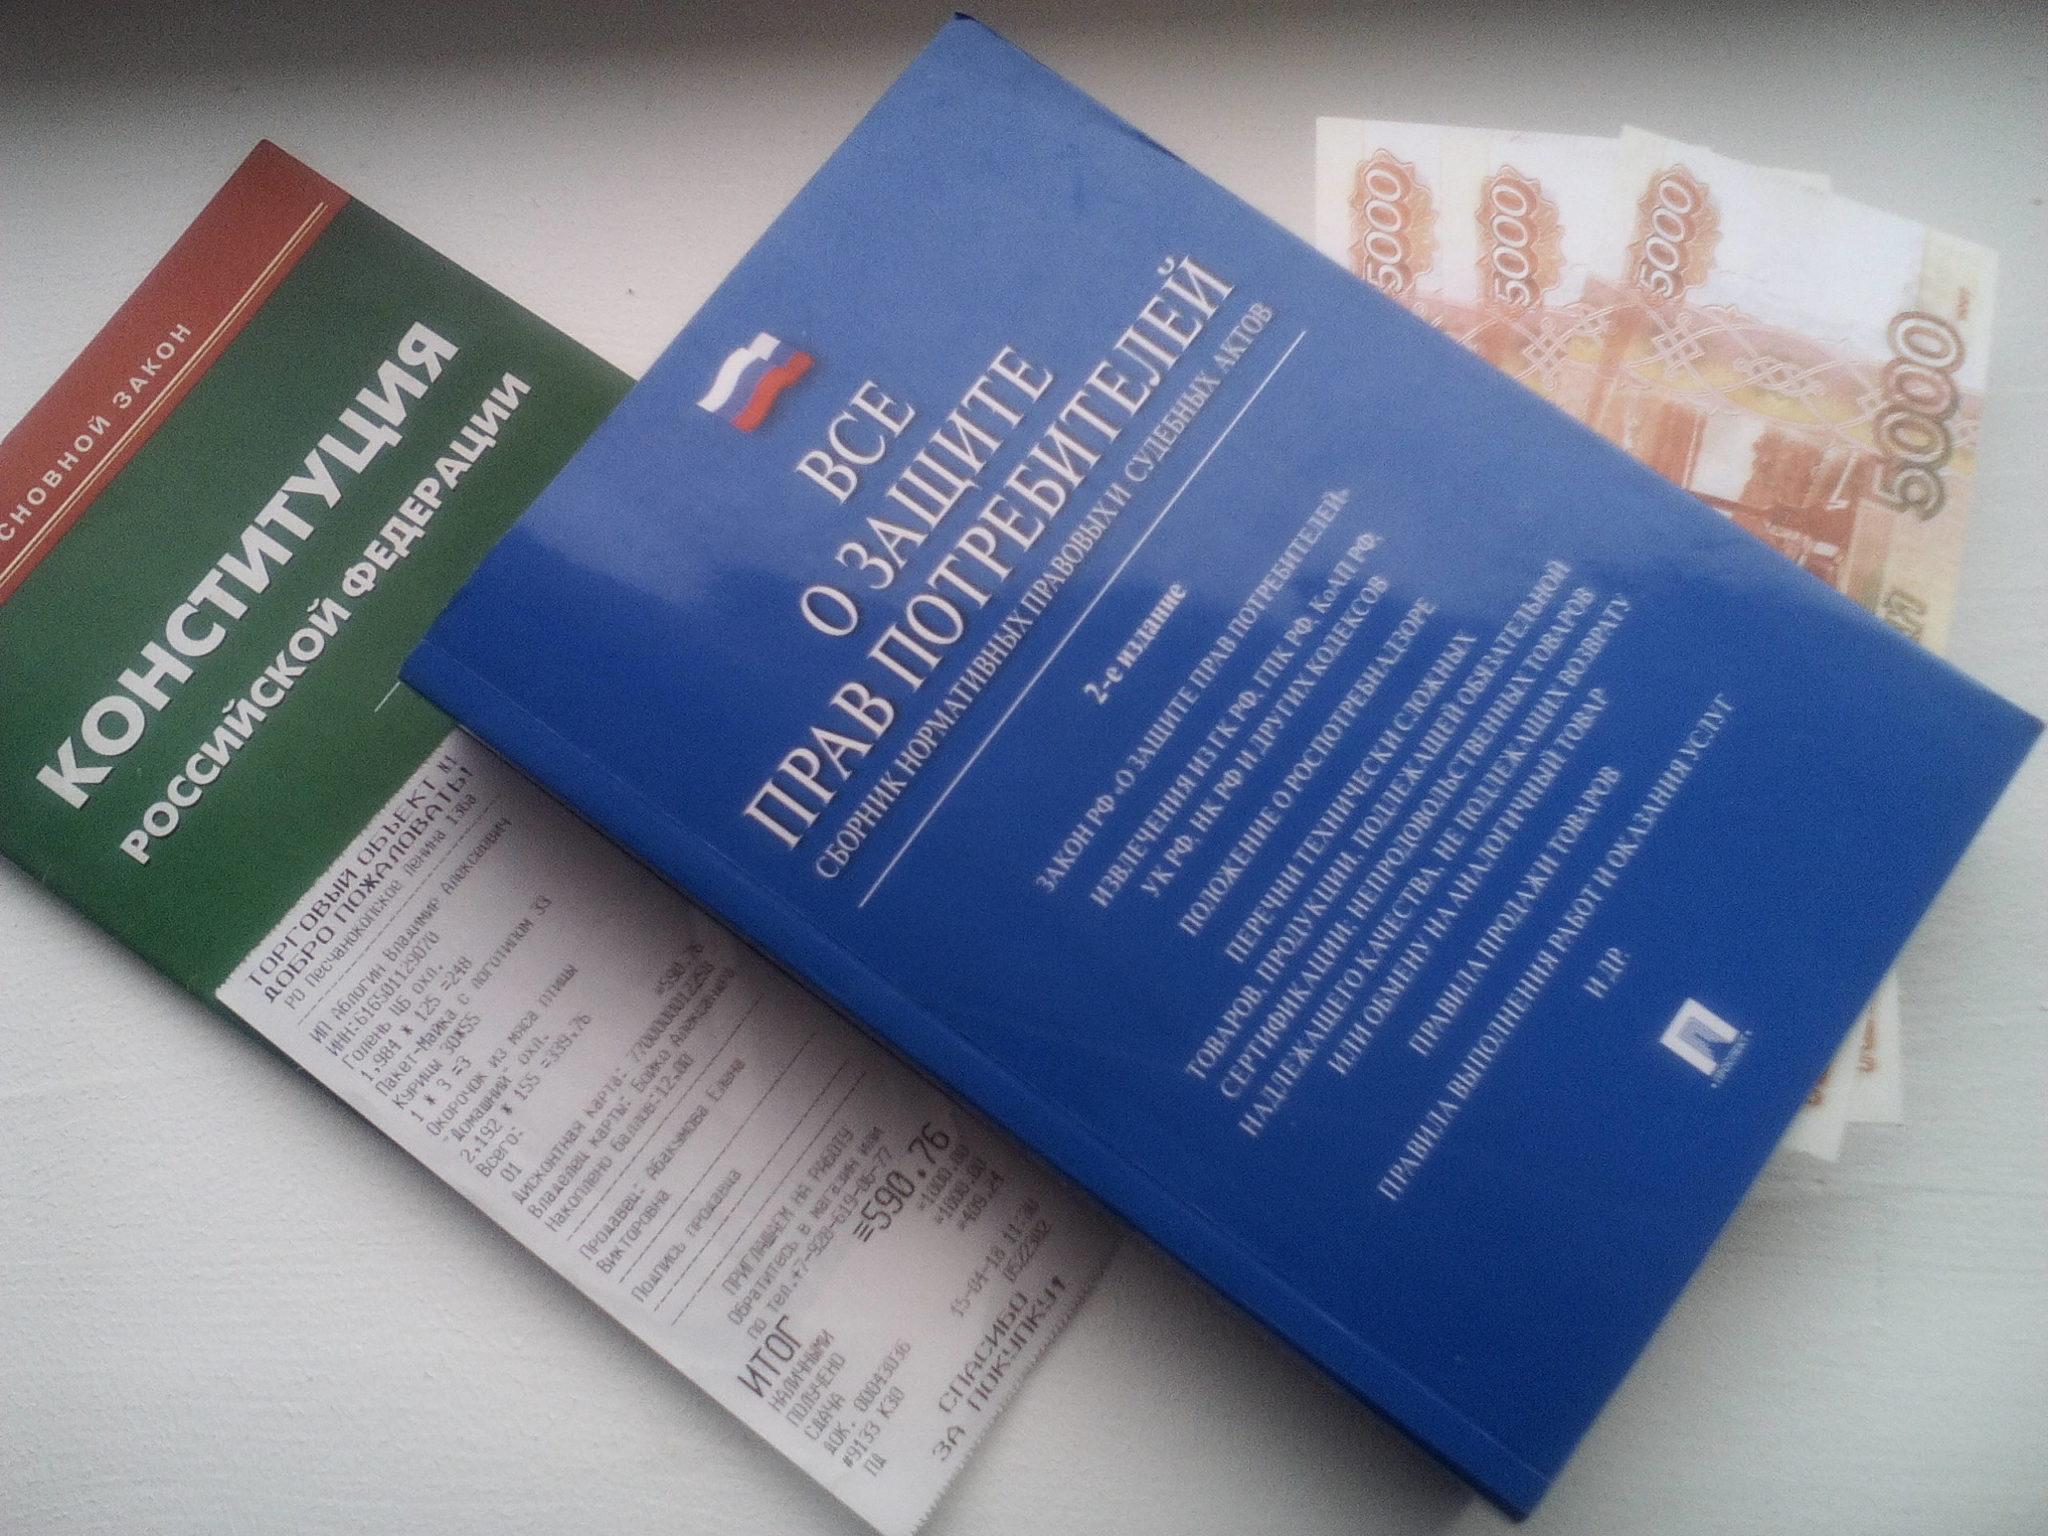 закон о защите прав потребителей обмен